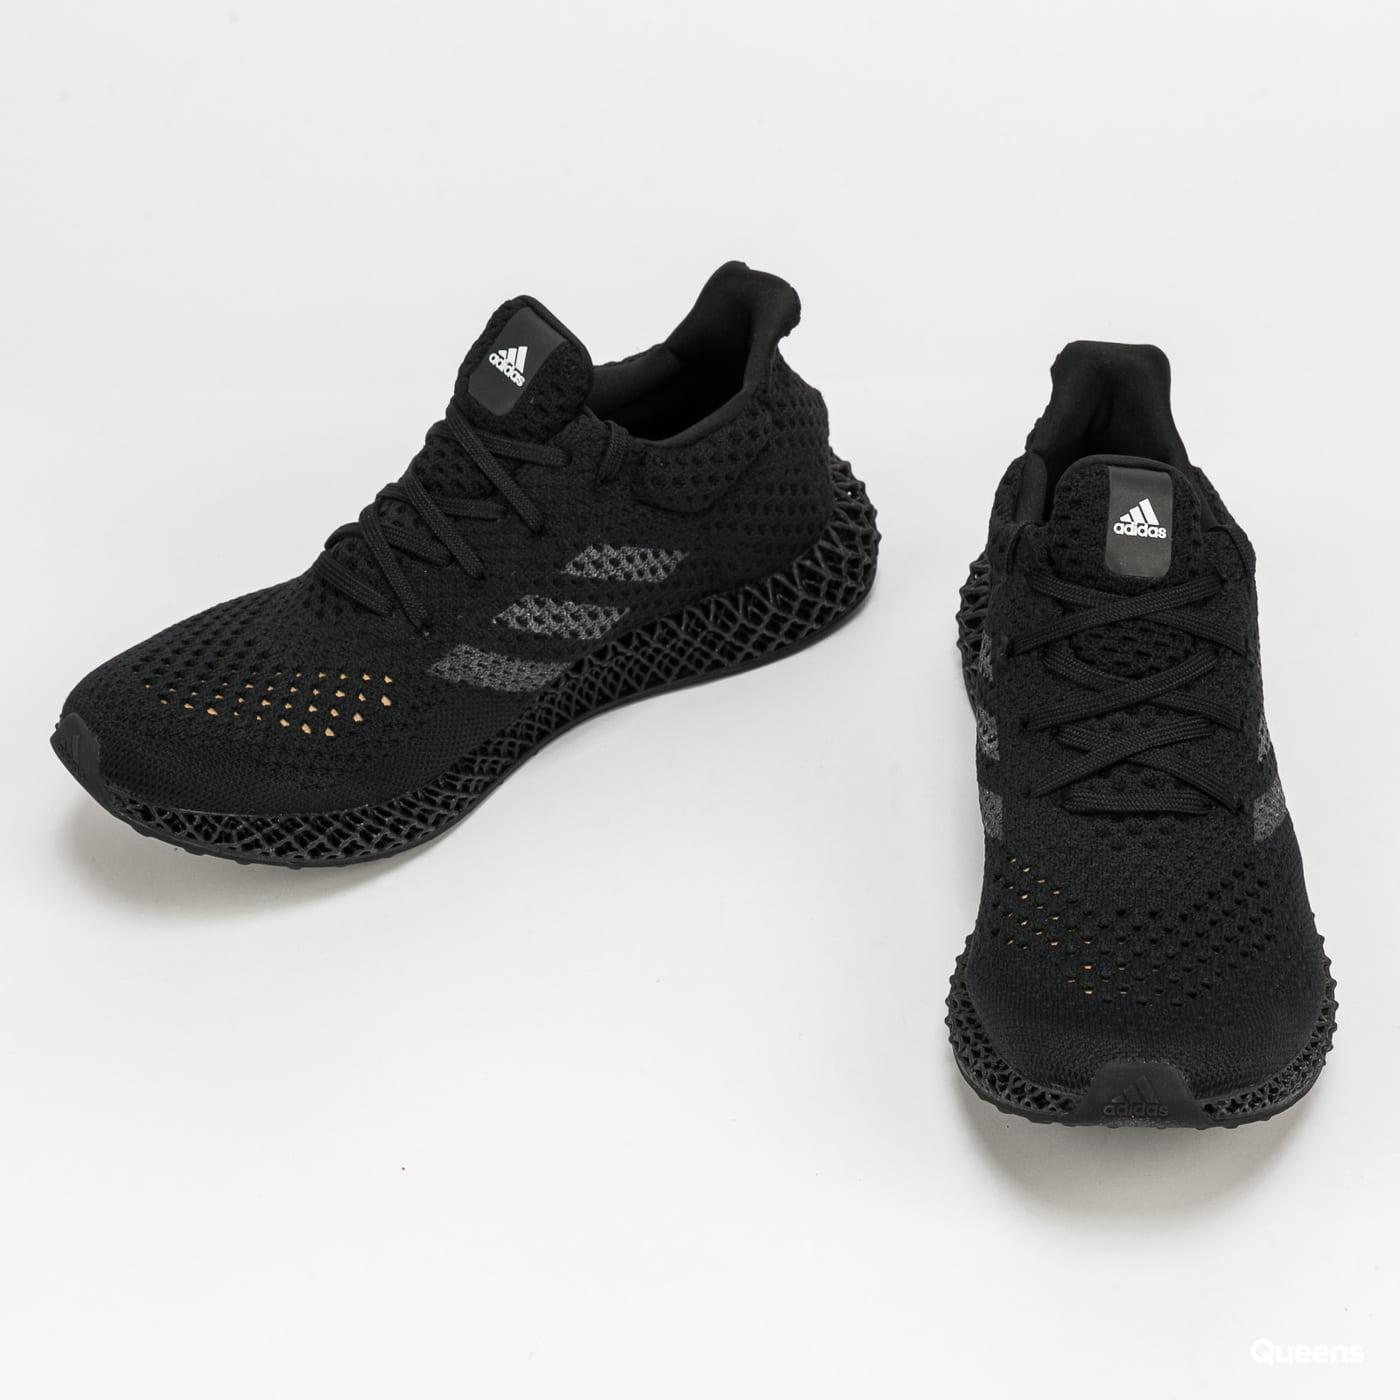 adidas Performance 4D Futurecraft cblack / carbon / cblack